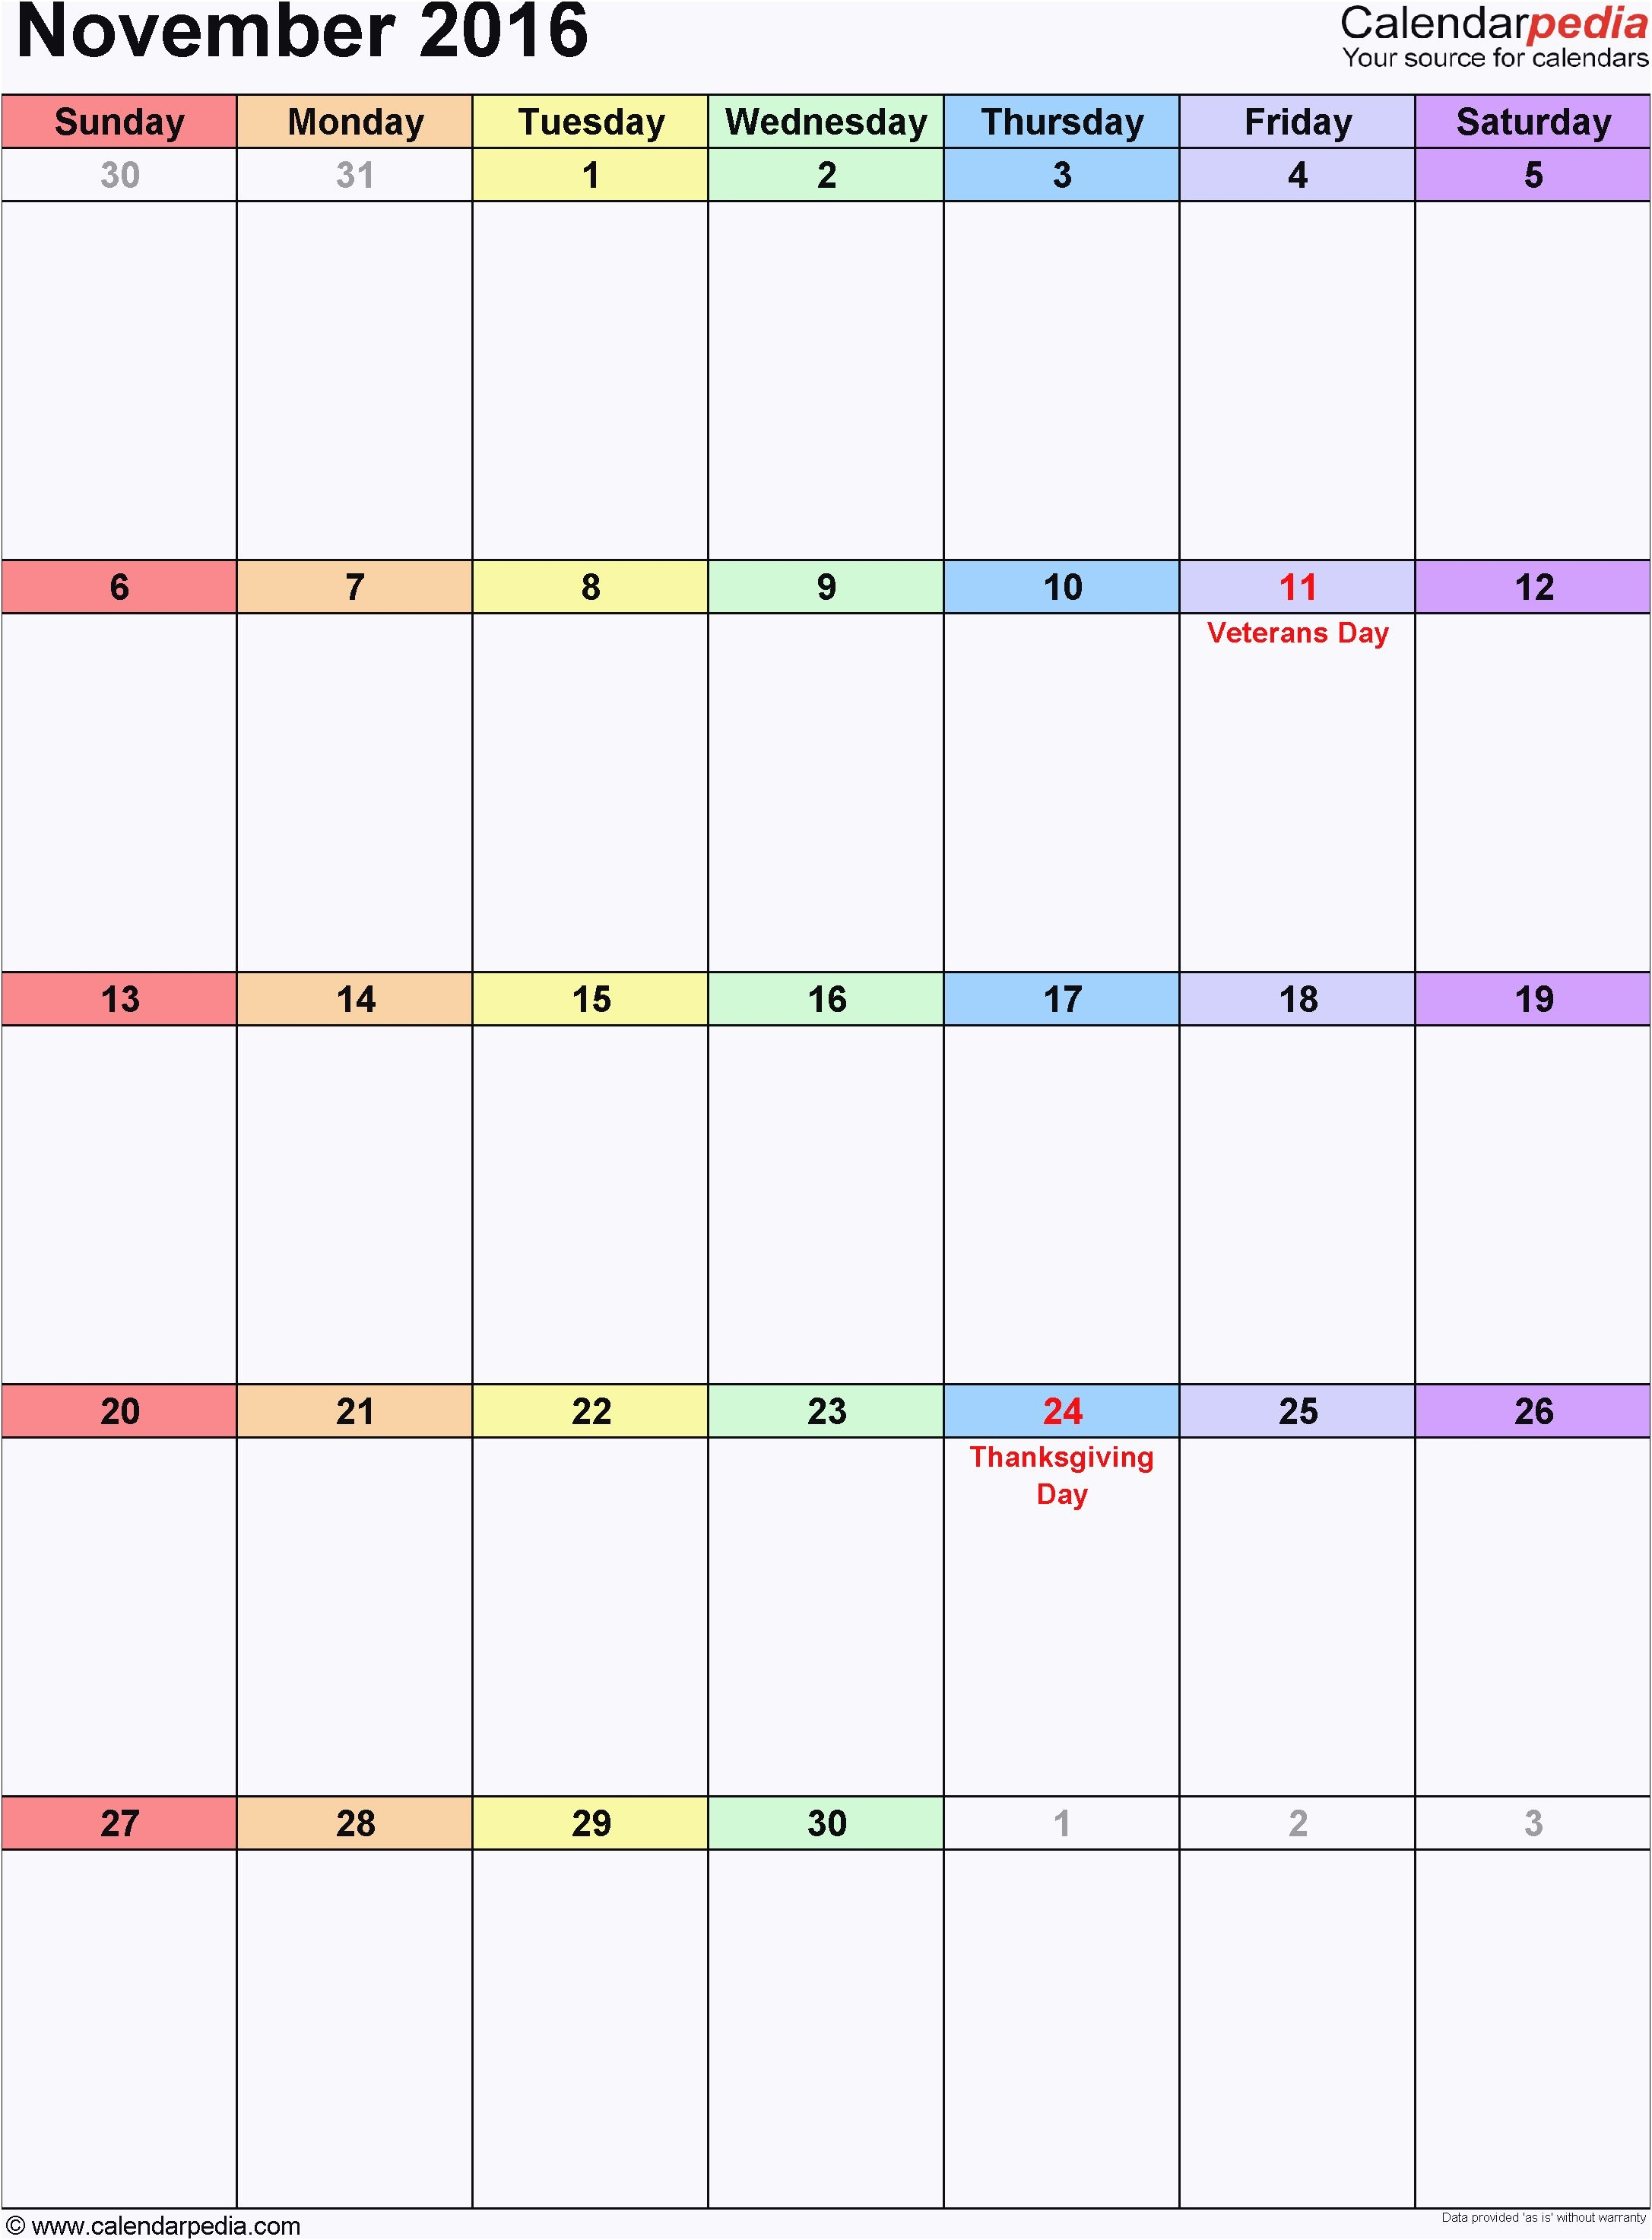 Kalender November 2017 Hochformat als Excel Vorlage